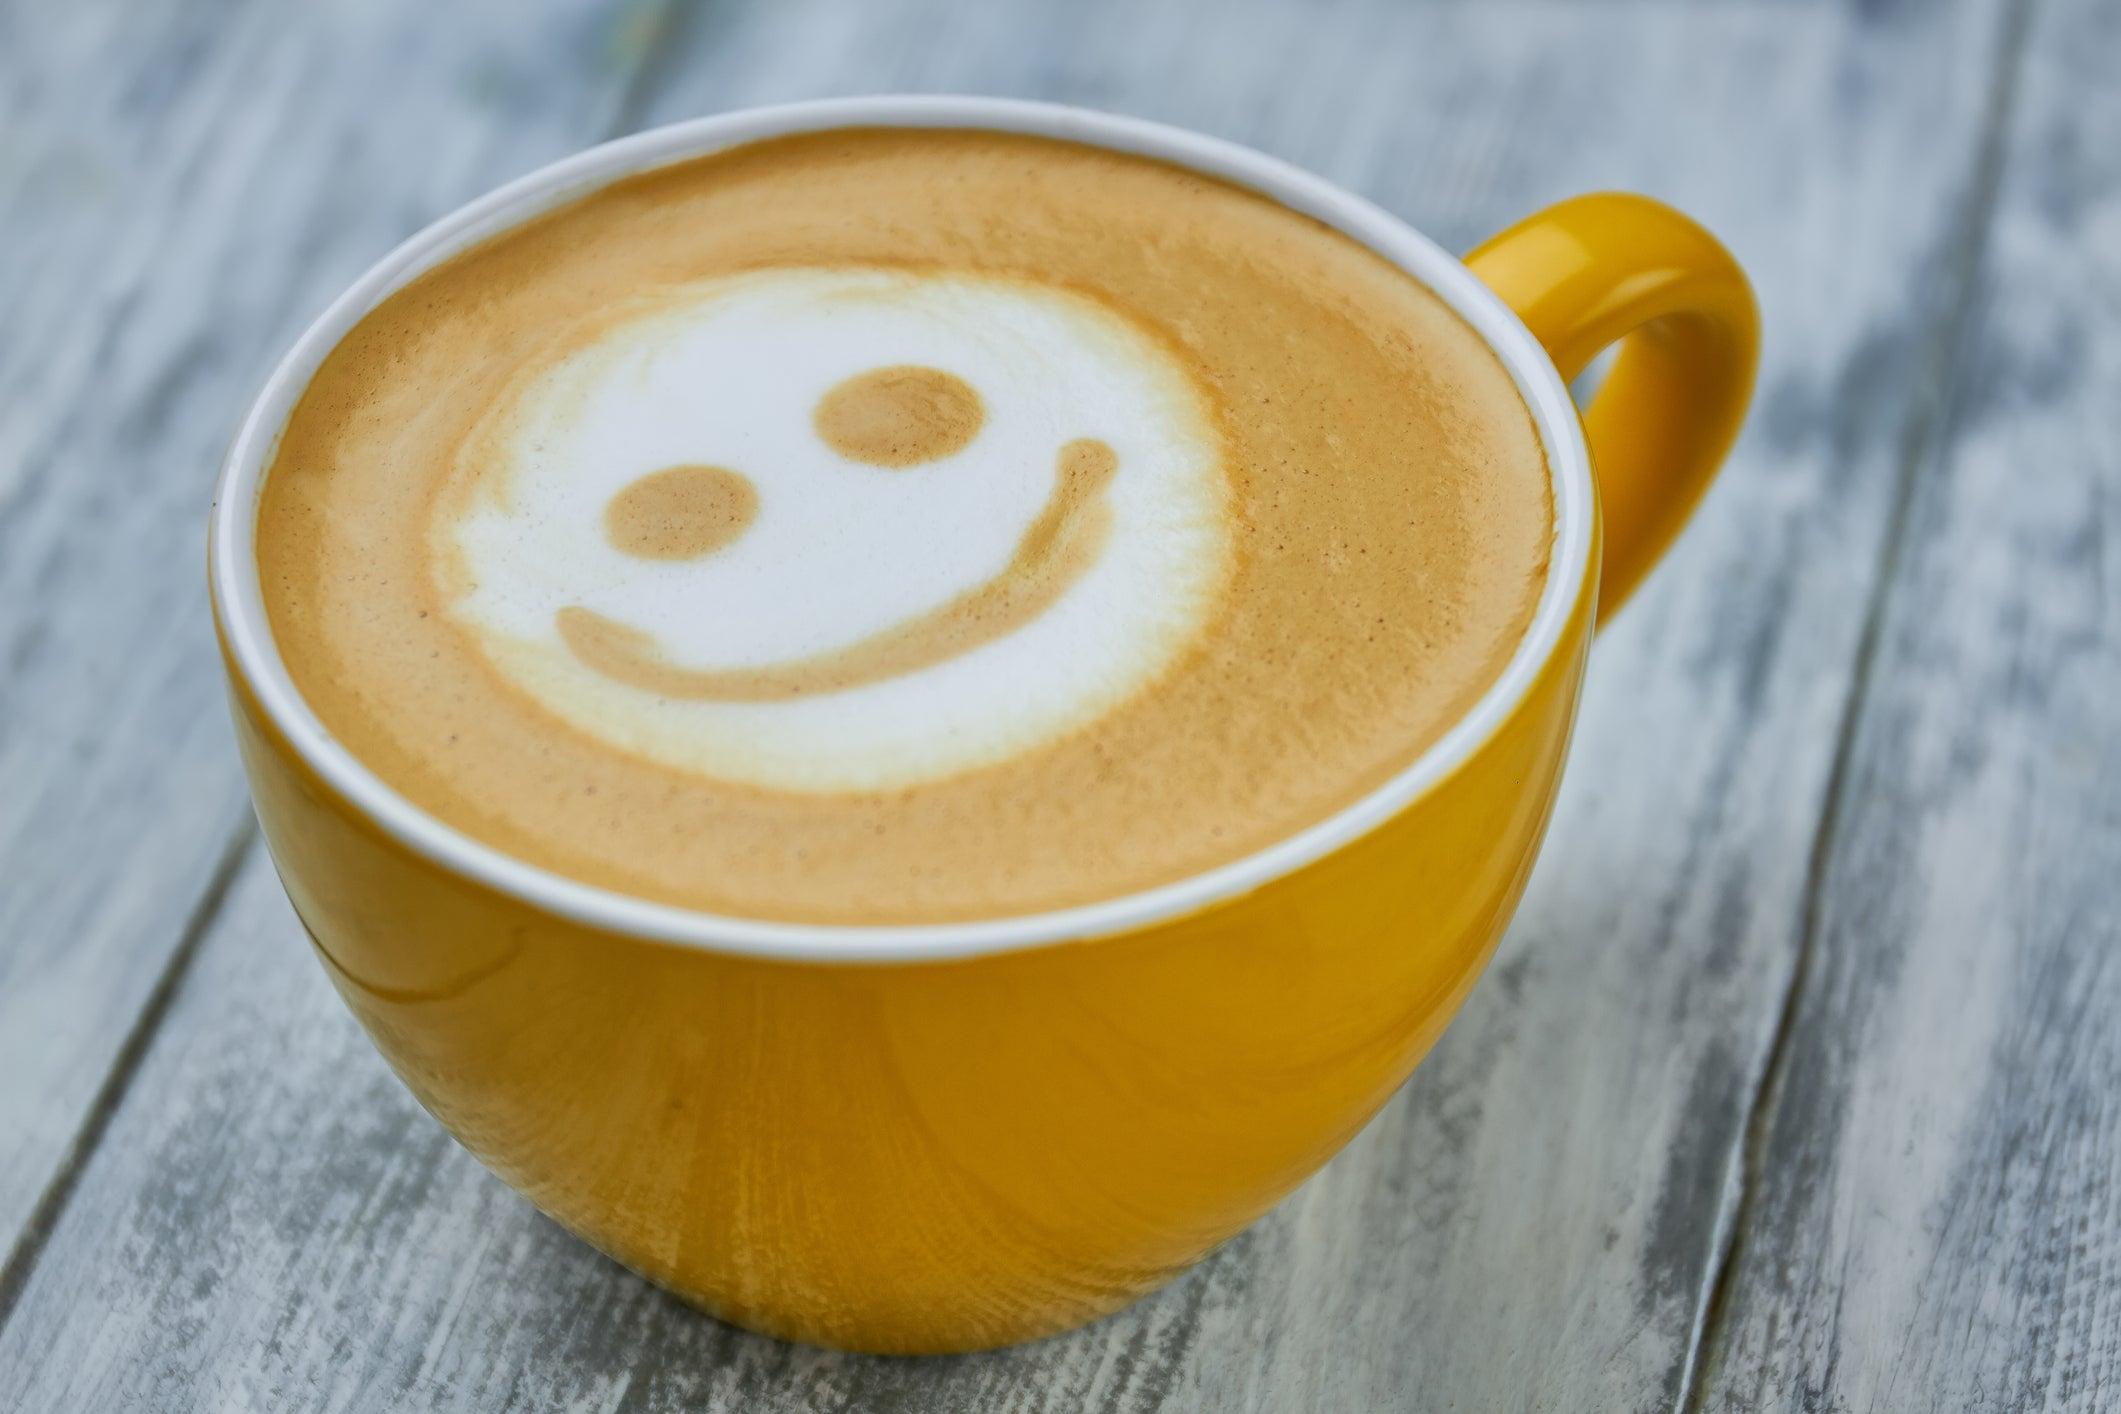 3 Great Reasons To Buy Starbucks Stock @themotleyfool #stocks $sbux photo